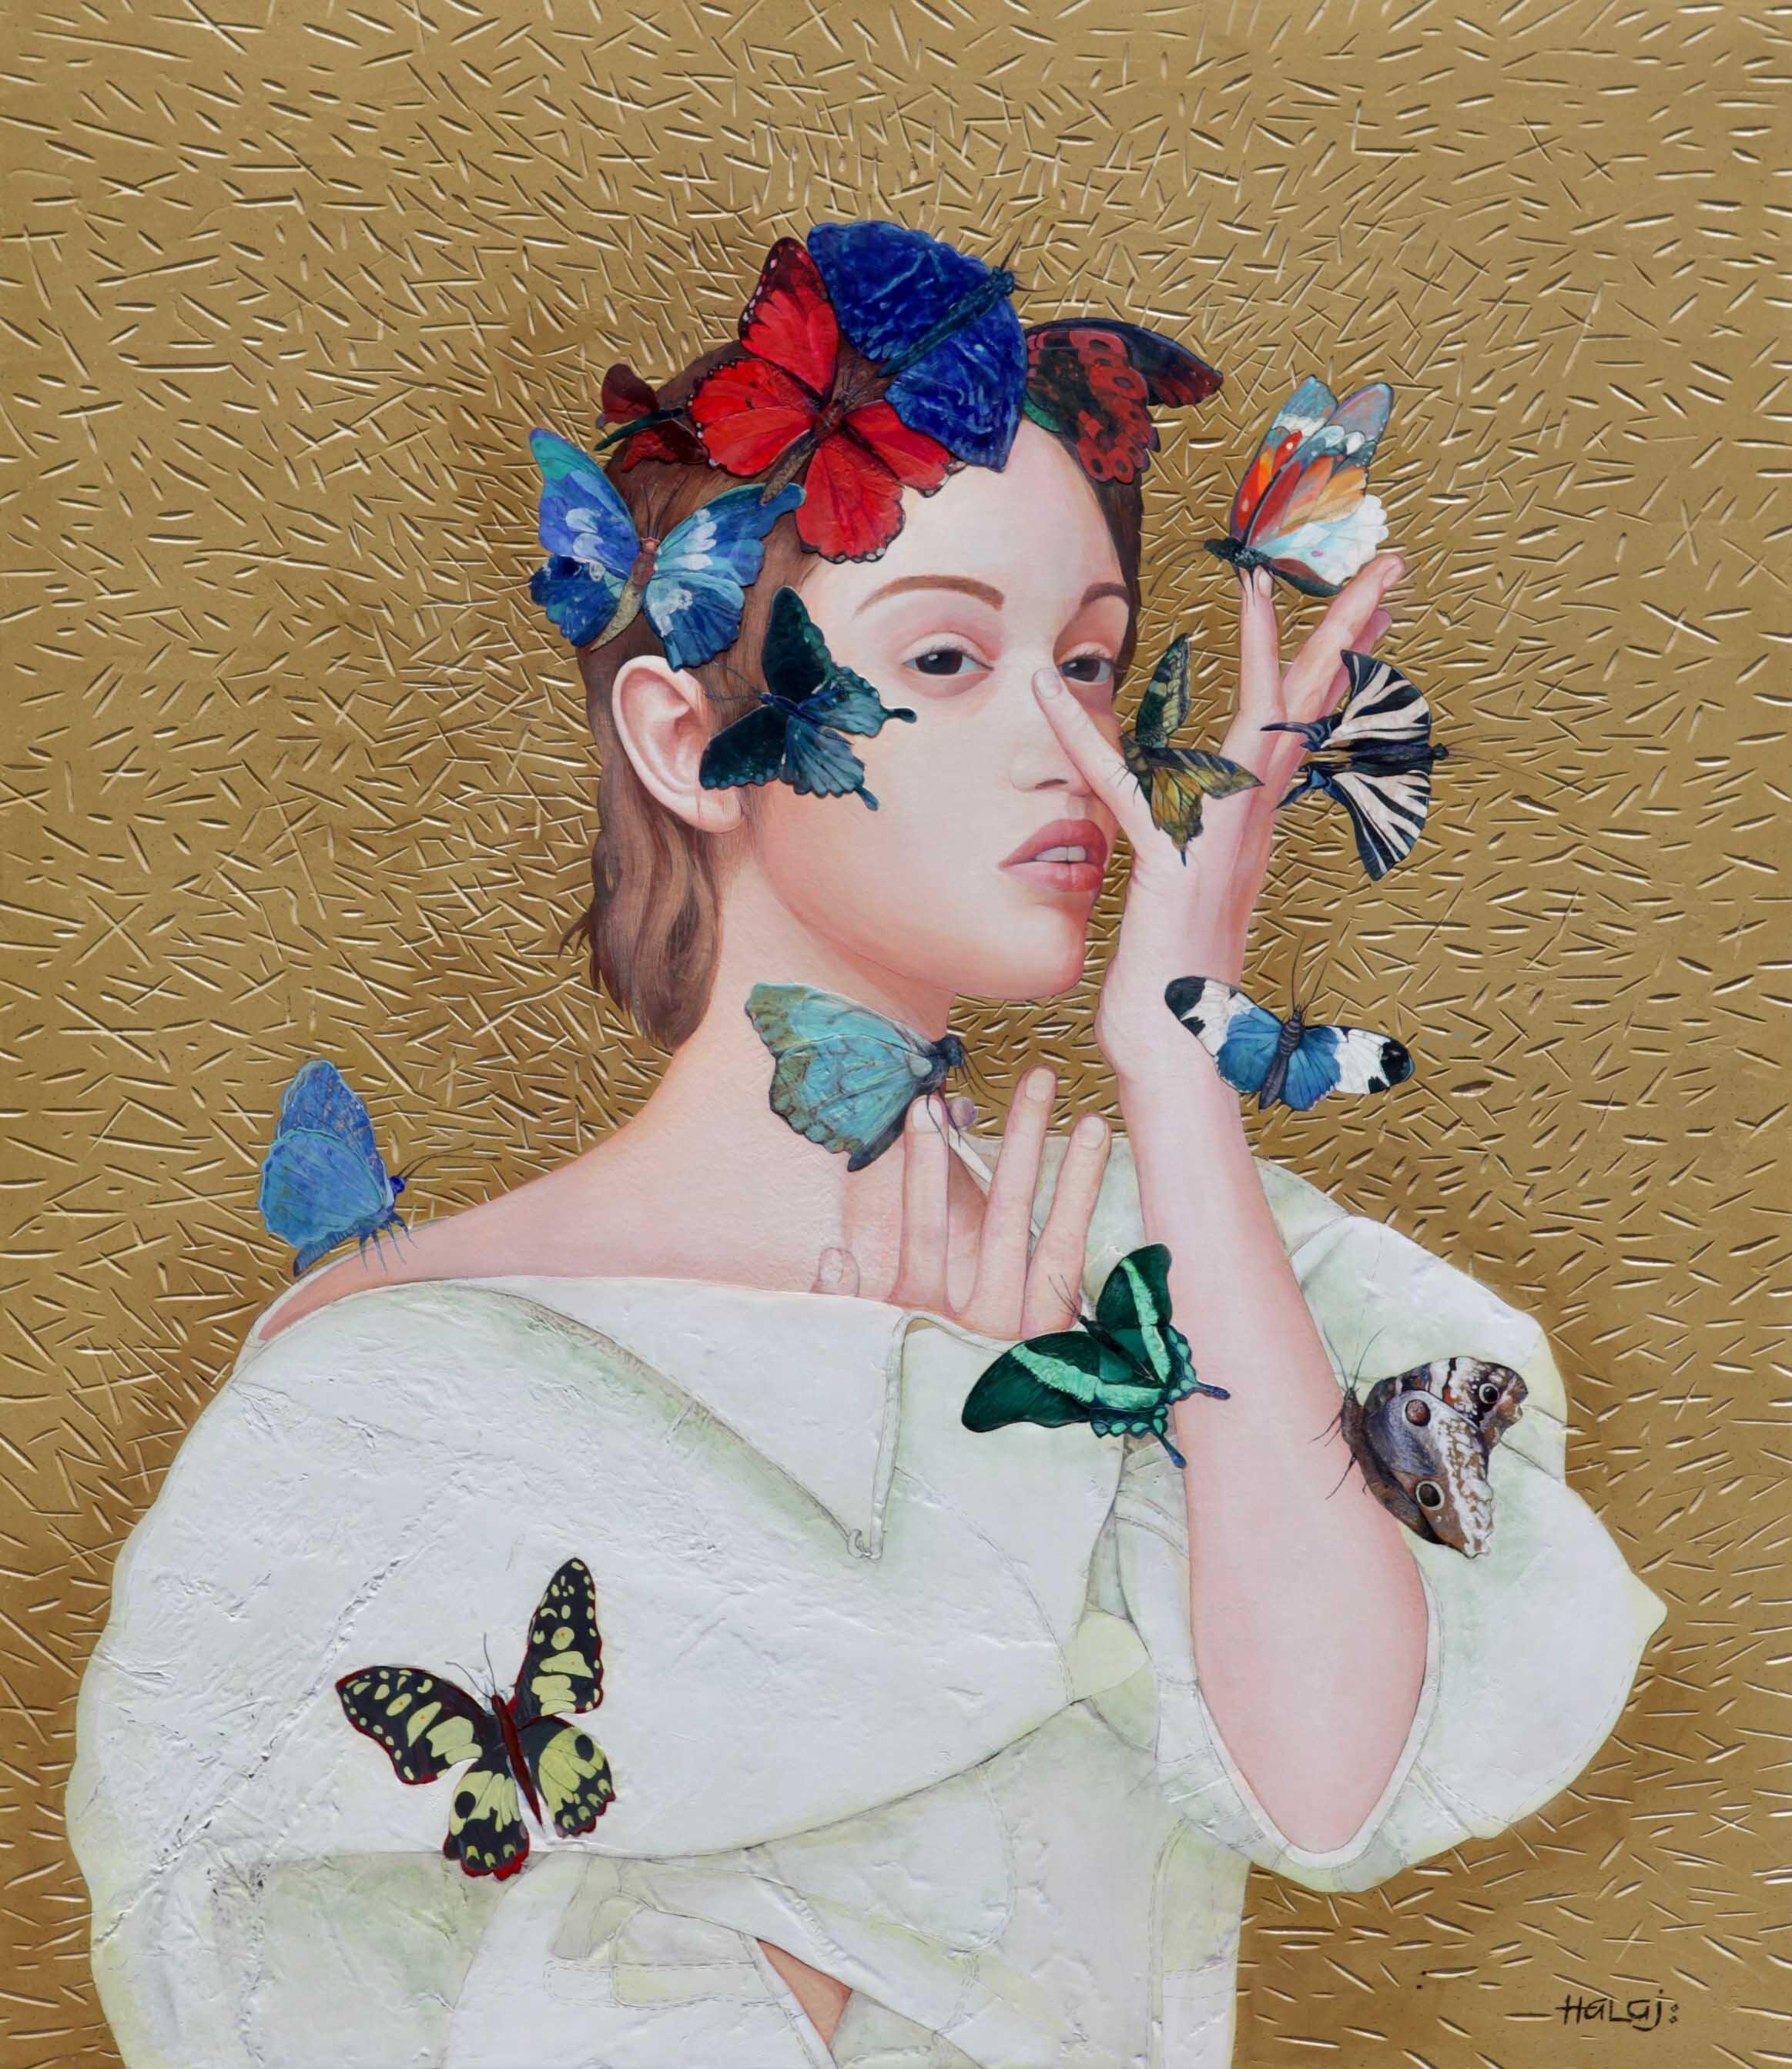 "Minas Halaj "" Butterfly # 6 "" 2019, Oil mixed media on panel, 46x40 inches (116.84x101.6 cm.).jpg"